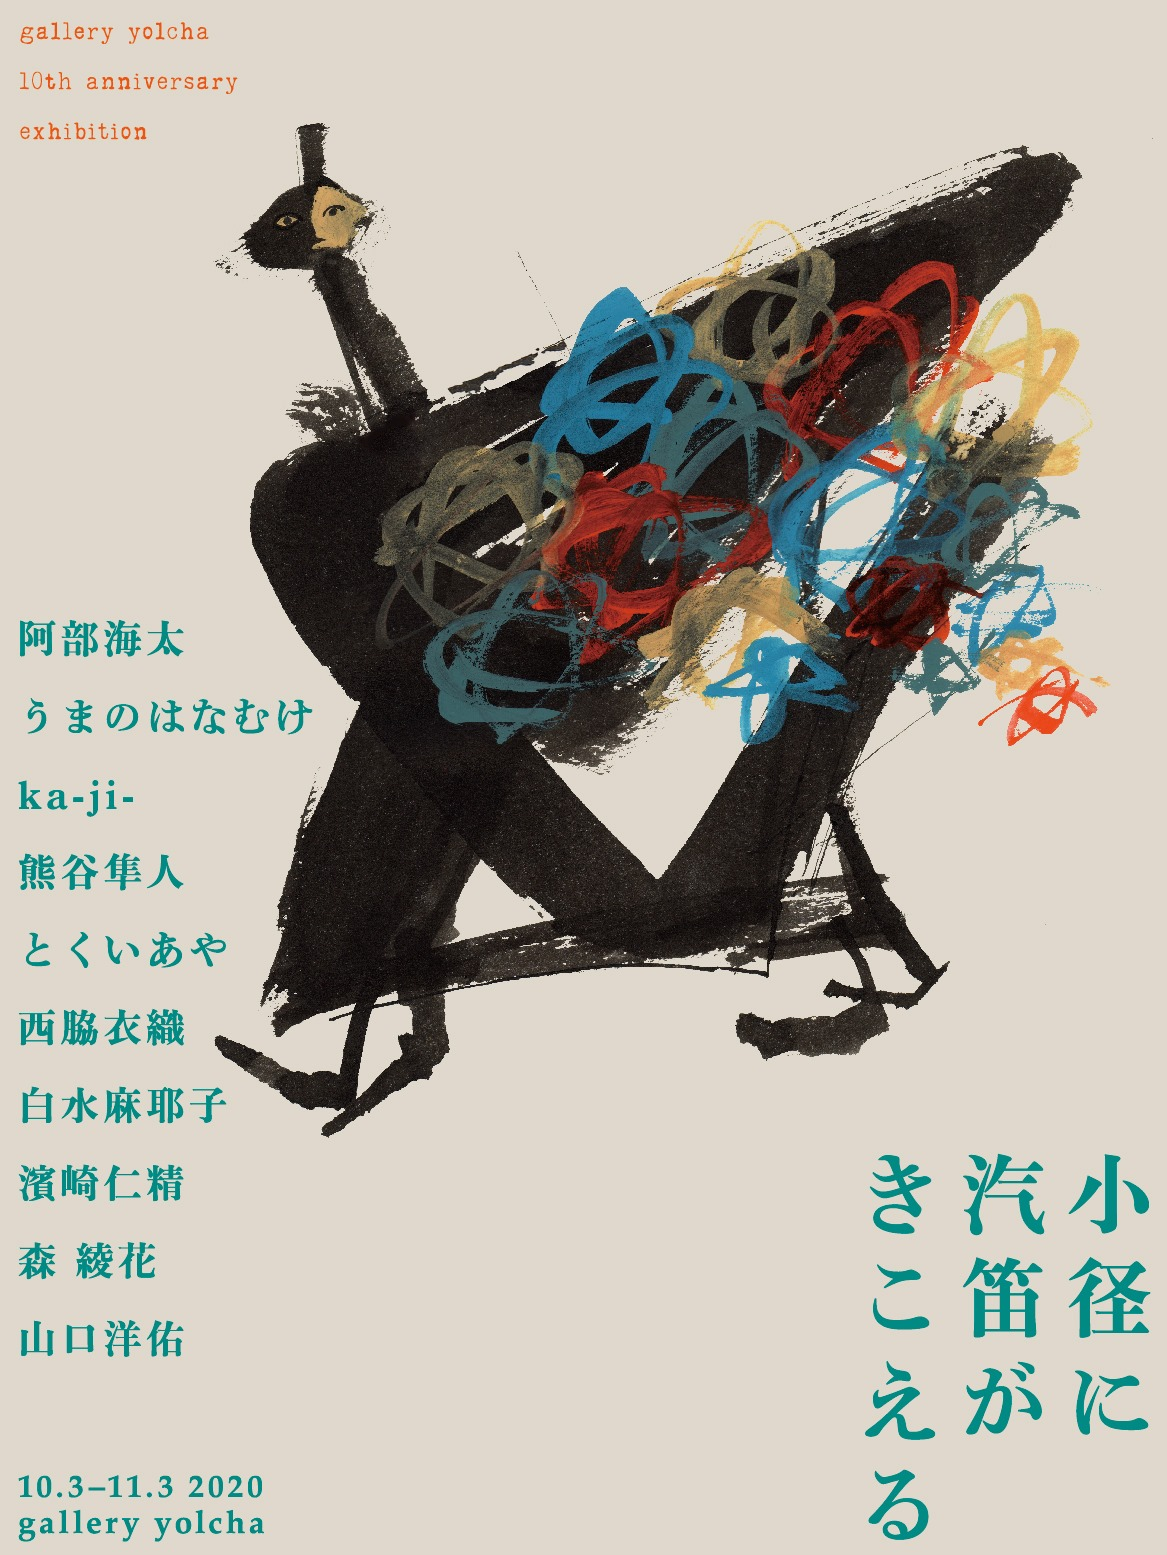 gallery yolcha 10周年記念展「小径に汽笛がきこえる」(大阪・gallery yolcha)